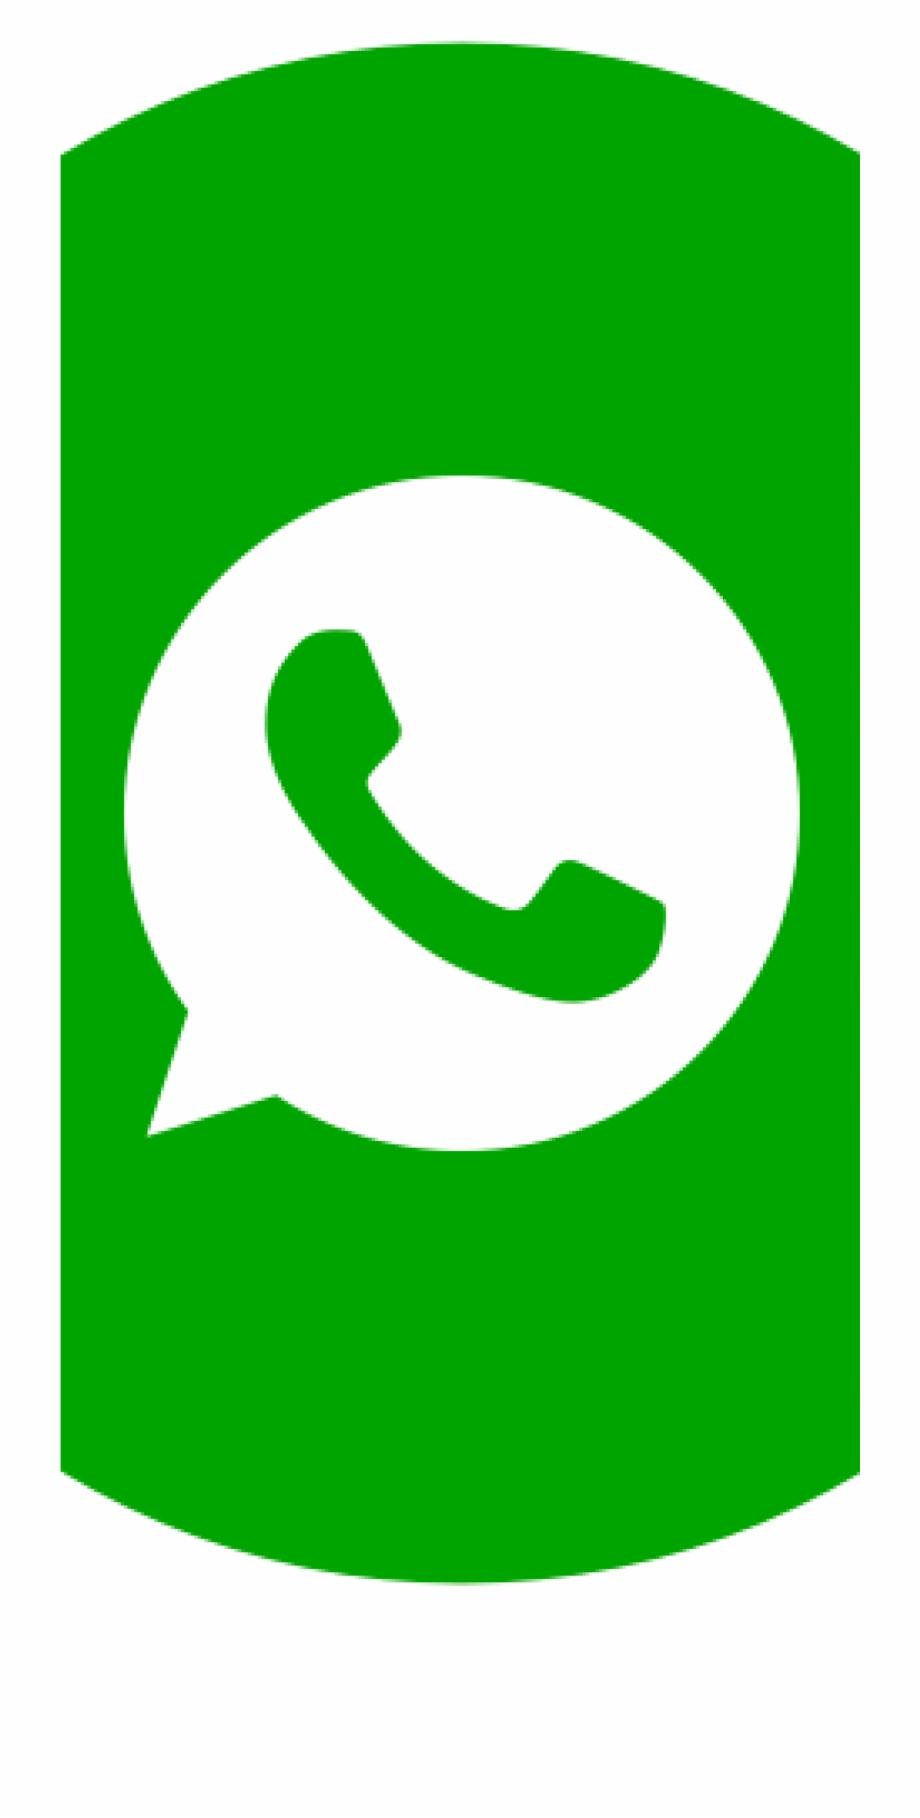 849448 Social 512x512.